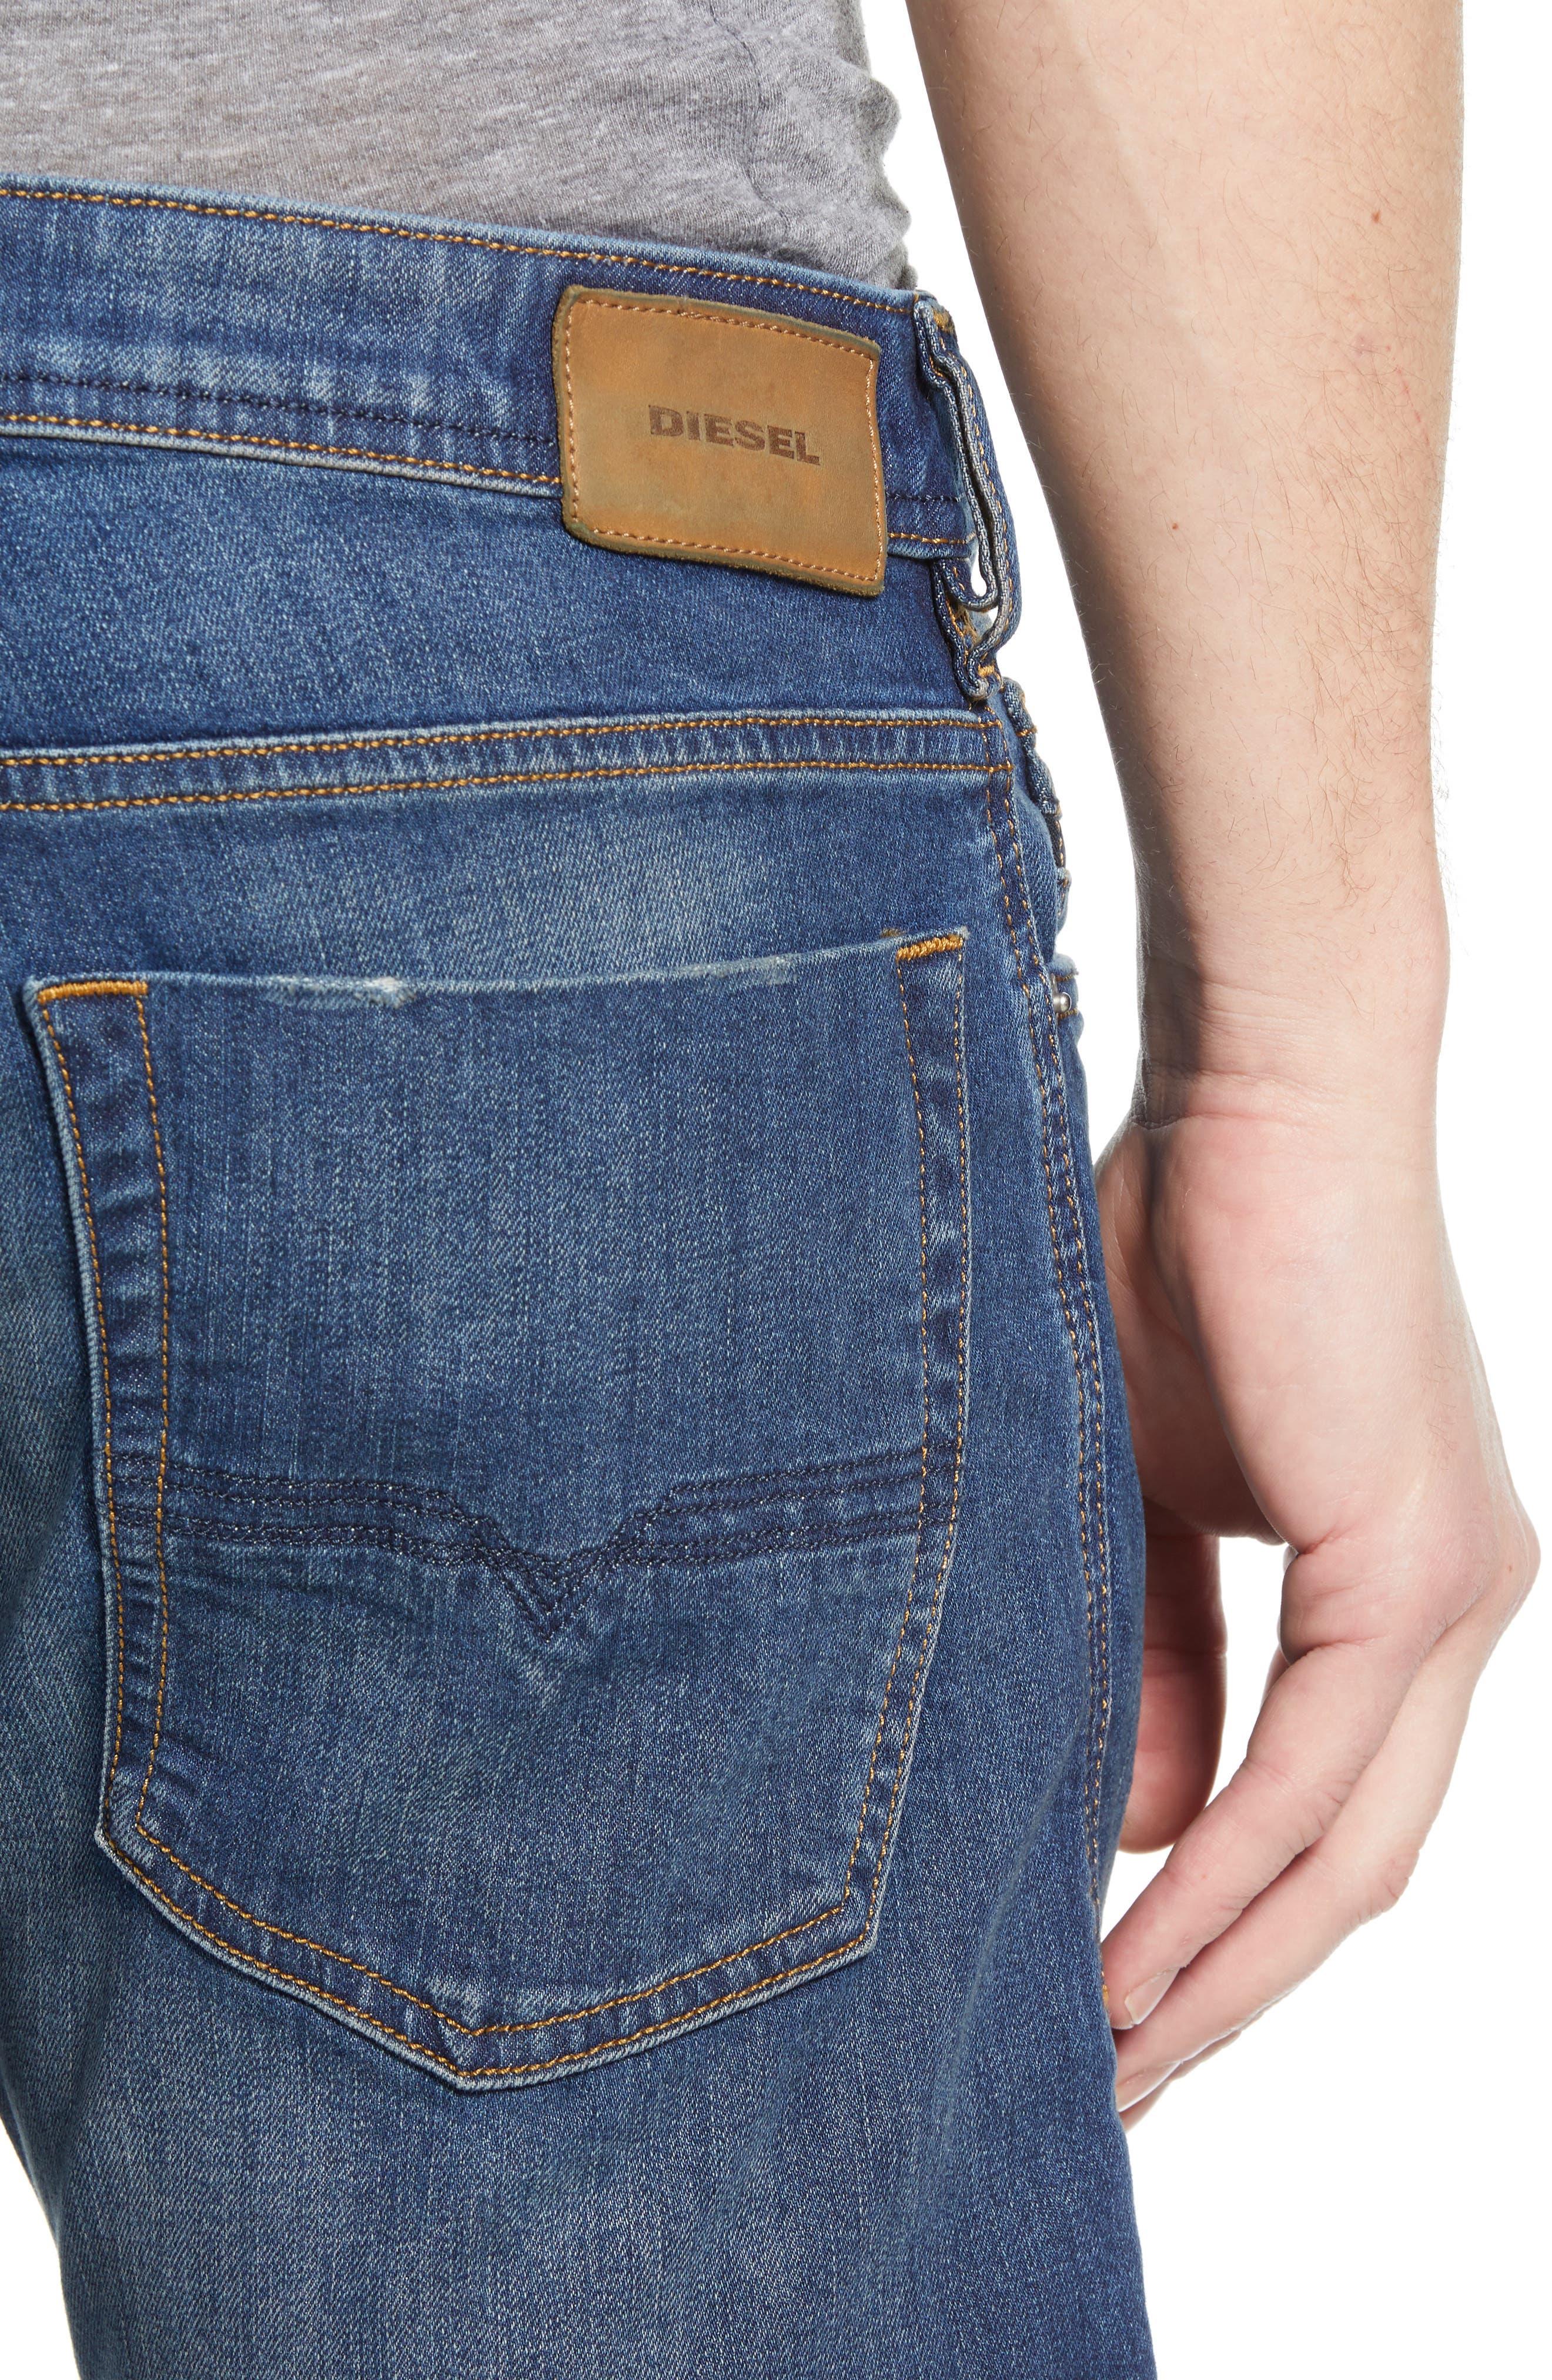 DIESEL<SUP>®</SUP>, Zatiny Bootcut Jeans, Alternate thumbnail 5, color, DENIM